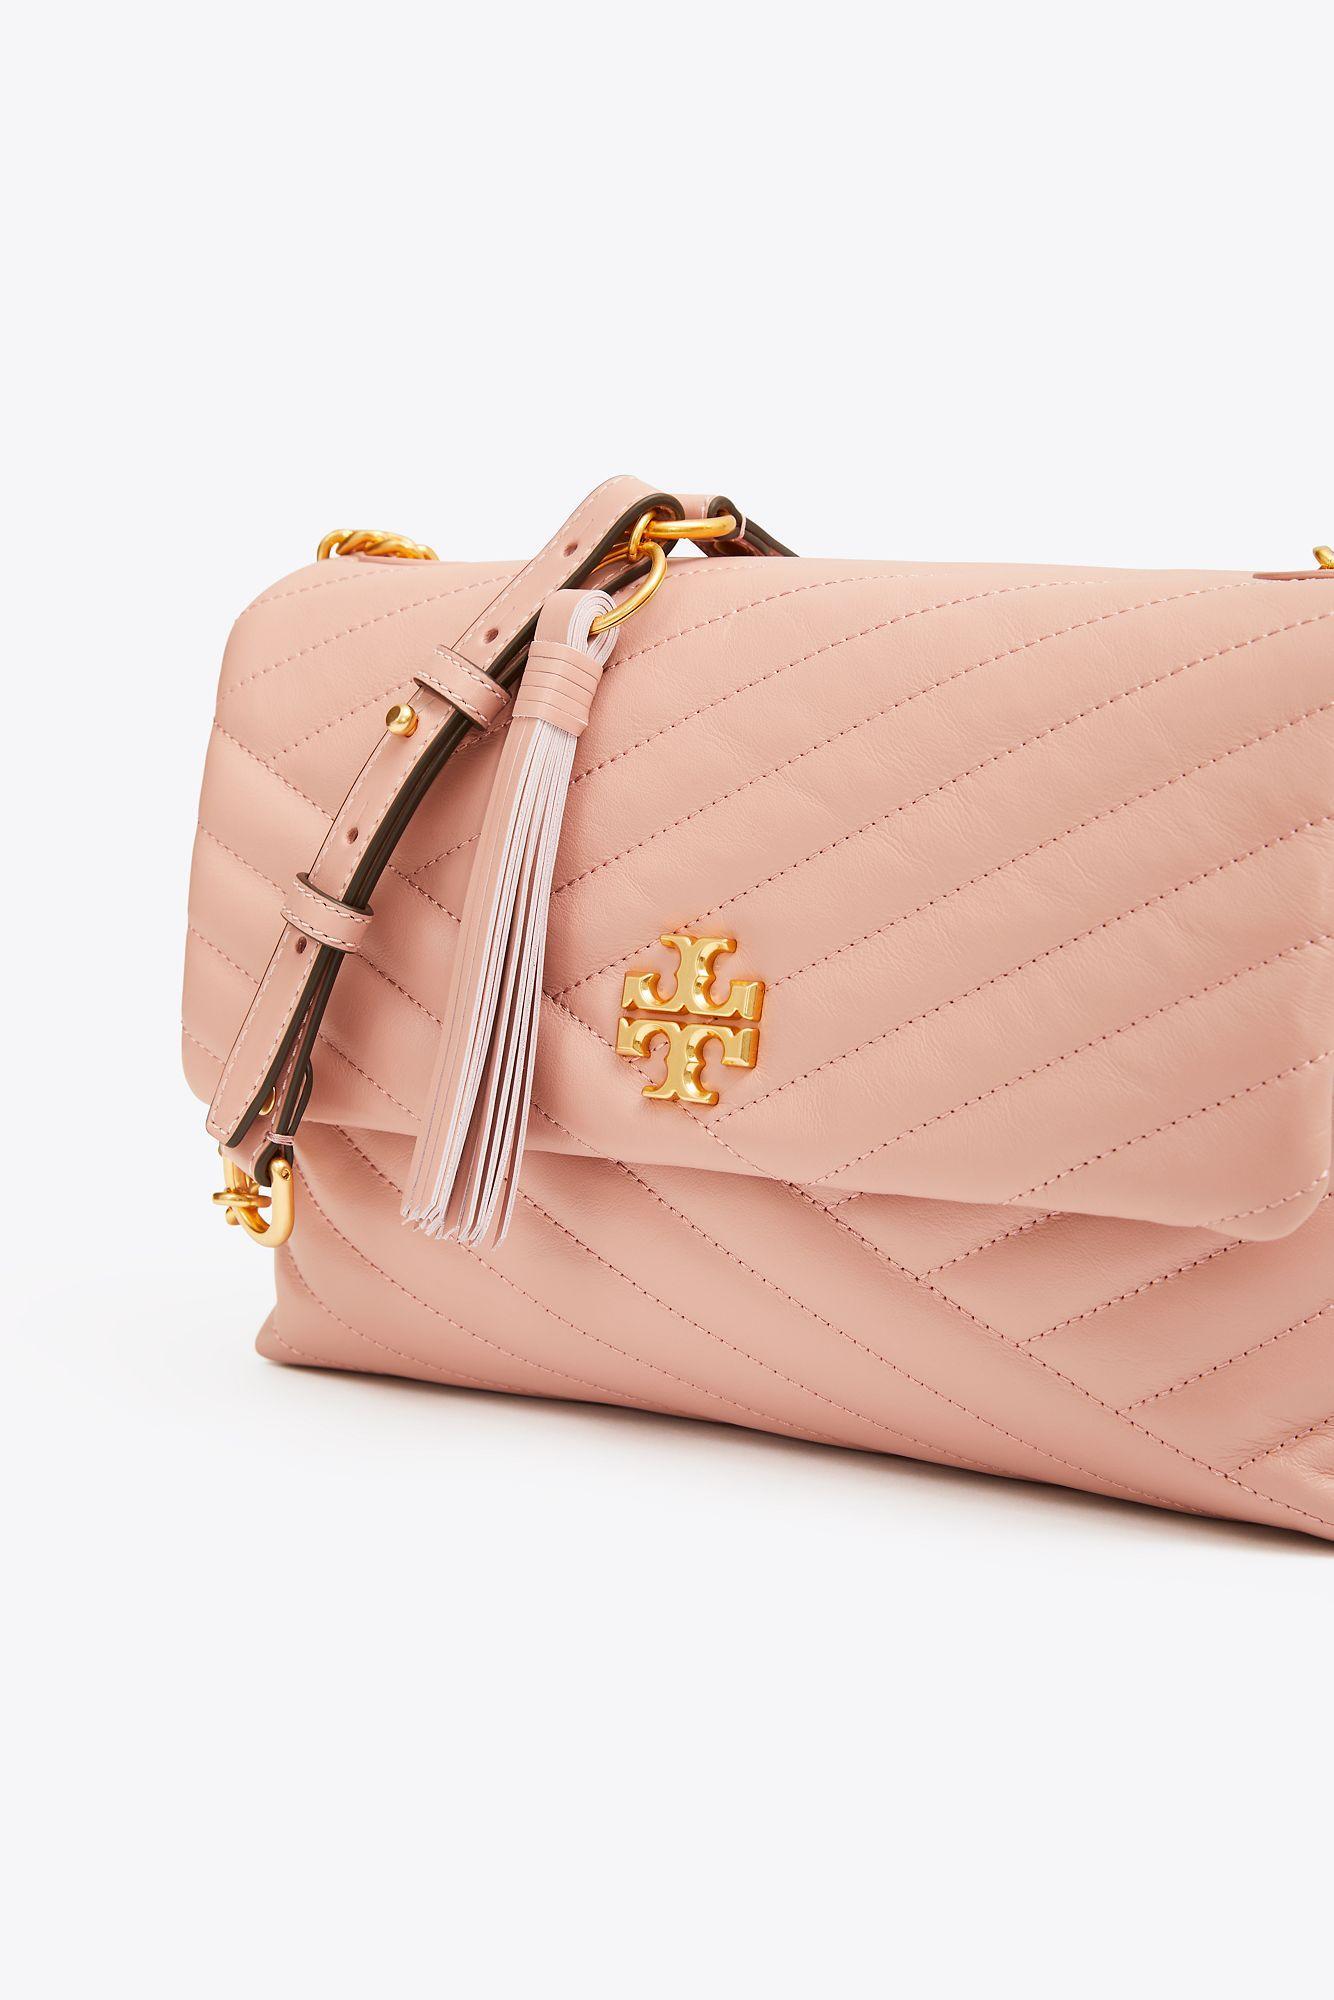 fefd3b370905 Tory Burch - Pink Kira Chevron Flap Shoulder Bag - Lyst. View fullscreen